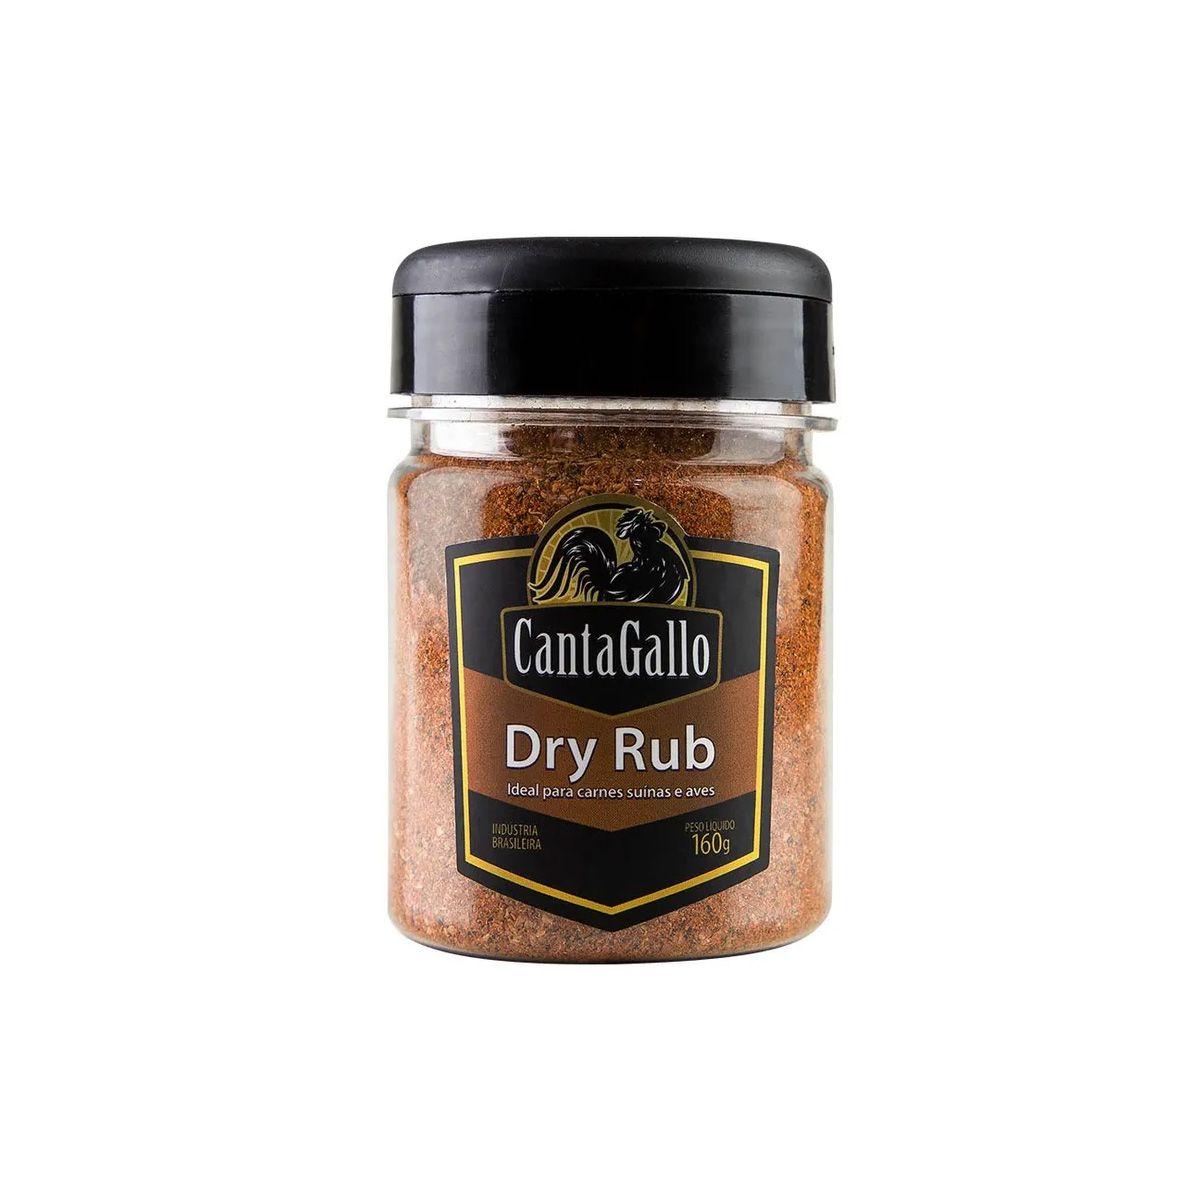 Dry Rub Cantagallo 160g